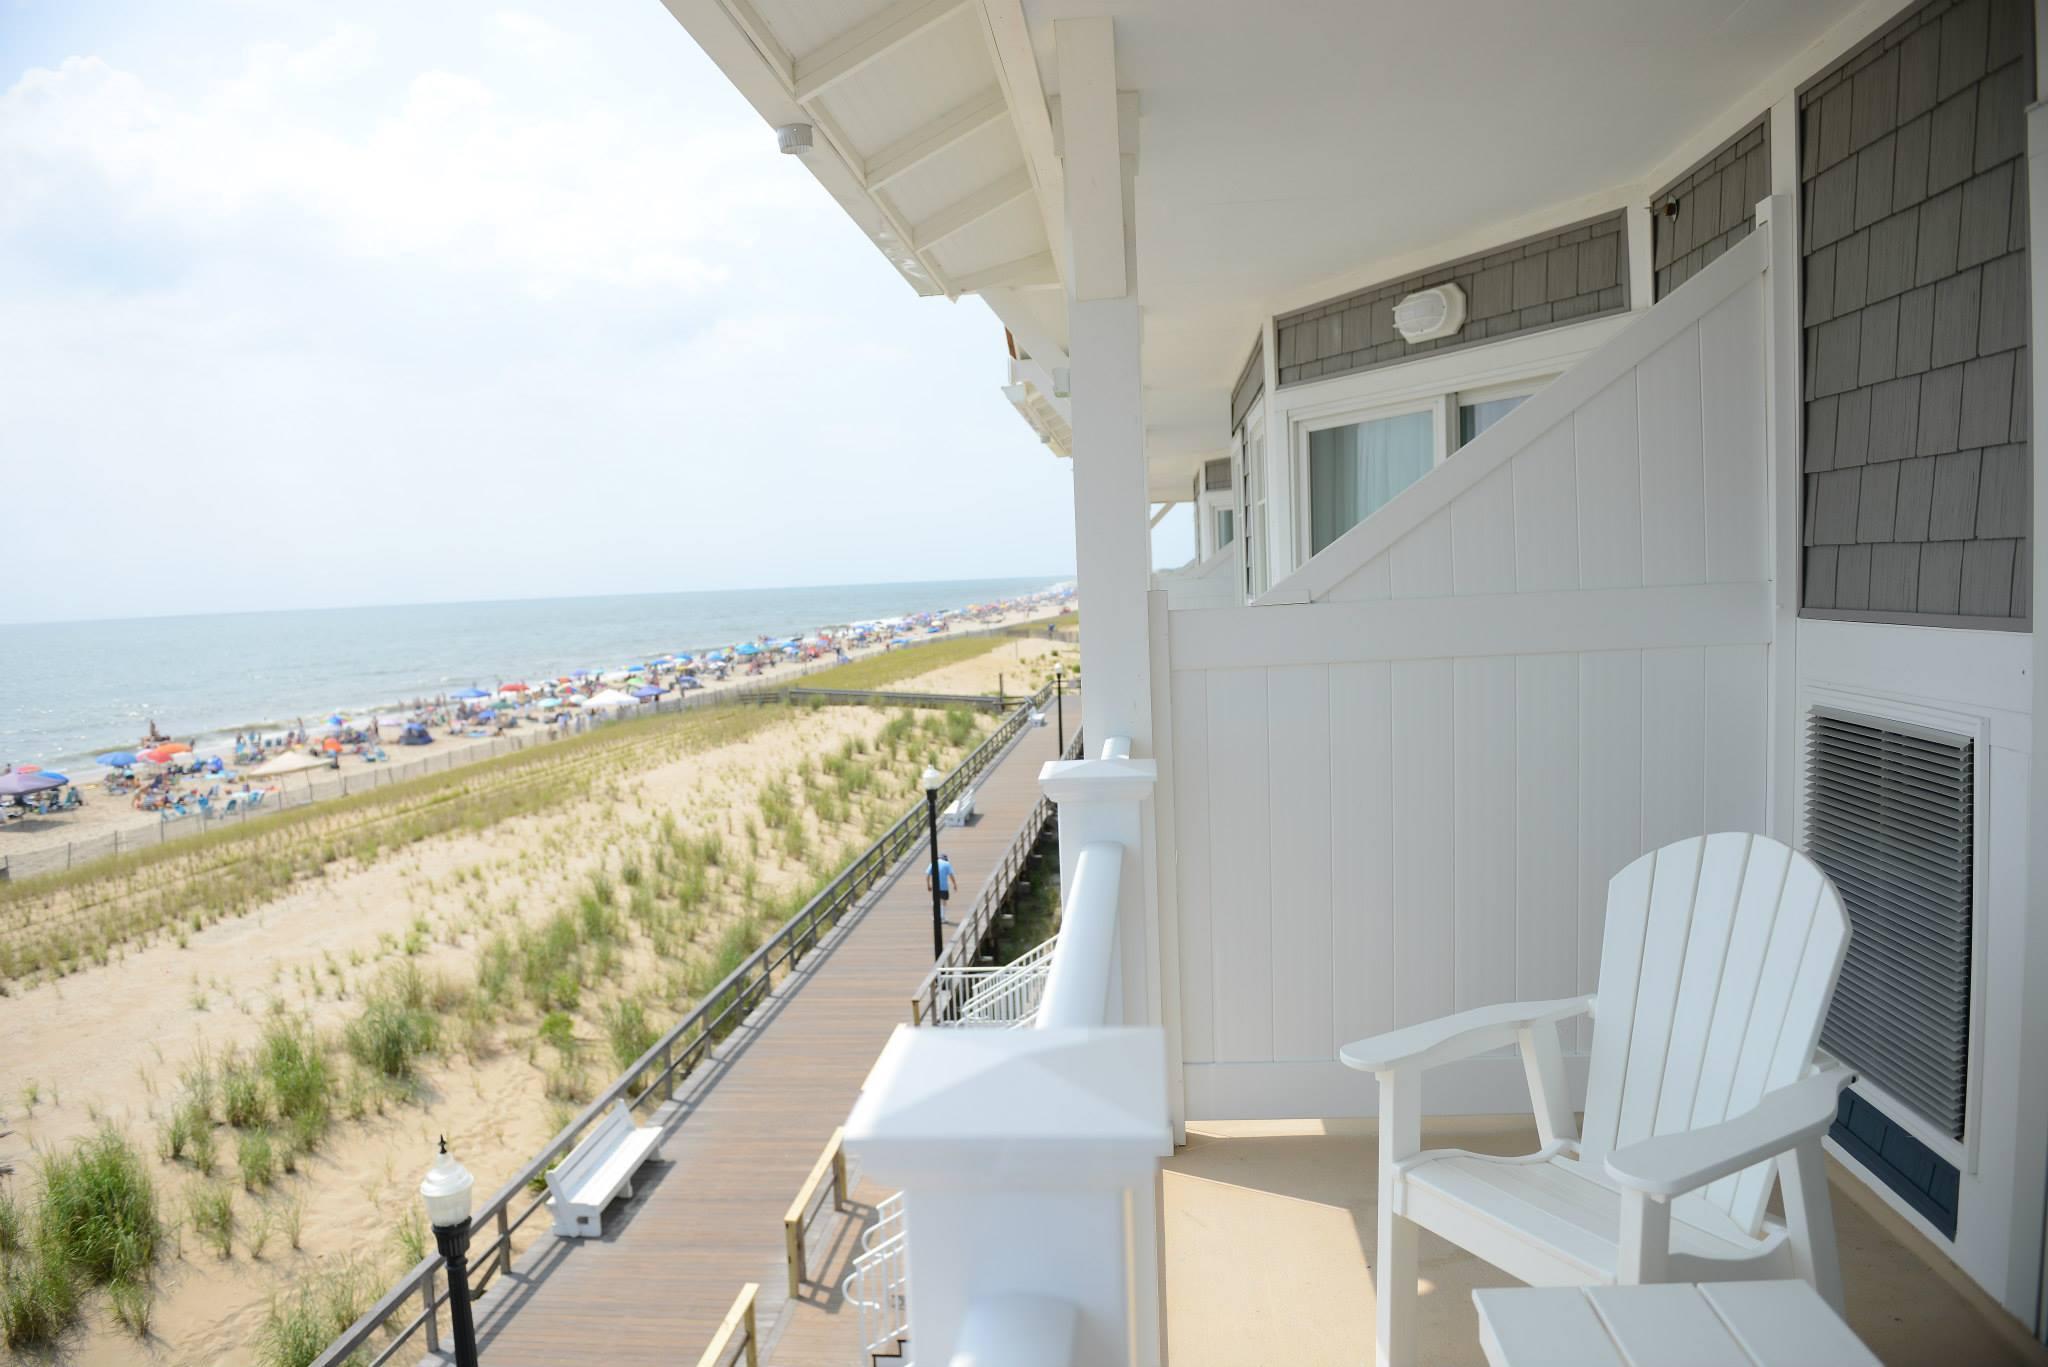 bethany beach ocean suites baltimore sun. Black Bedroom Furniture Sets. Home Design Ideas